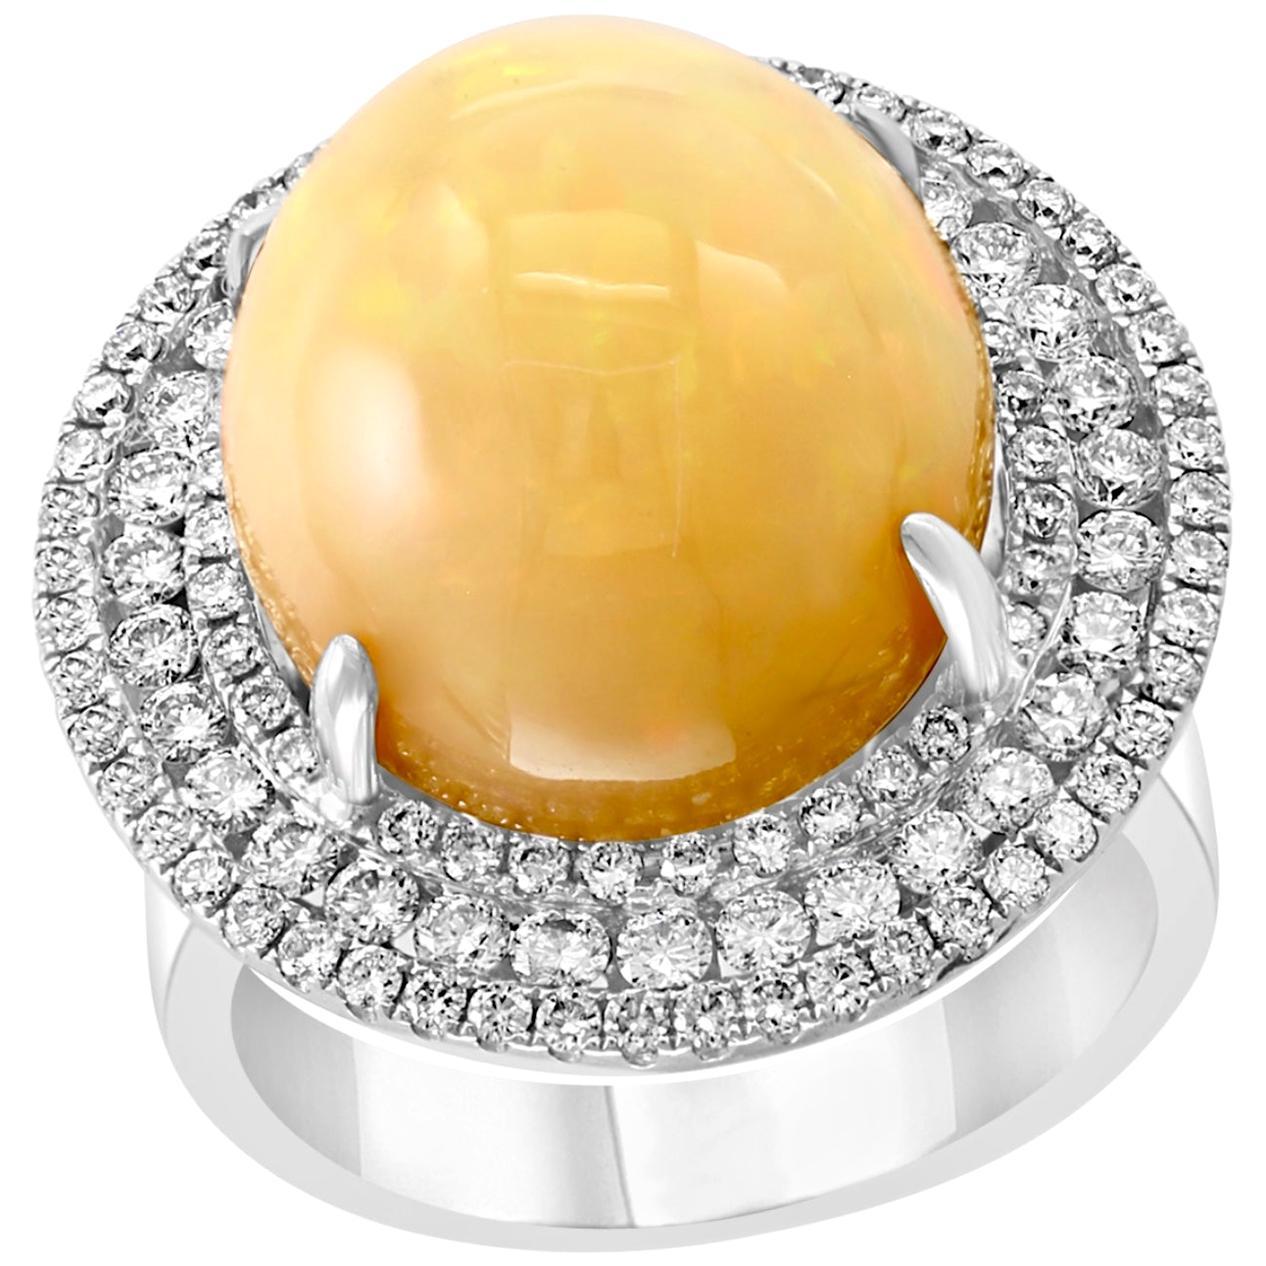 Round Opal and Diamond Cocktail Ring 18 Karat White Gold, Estate